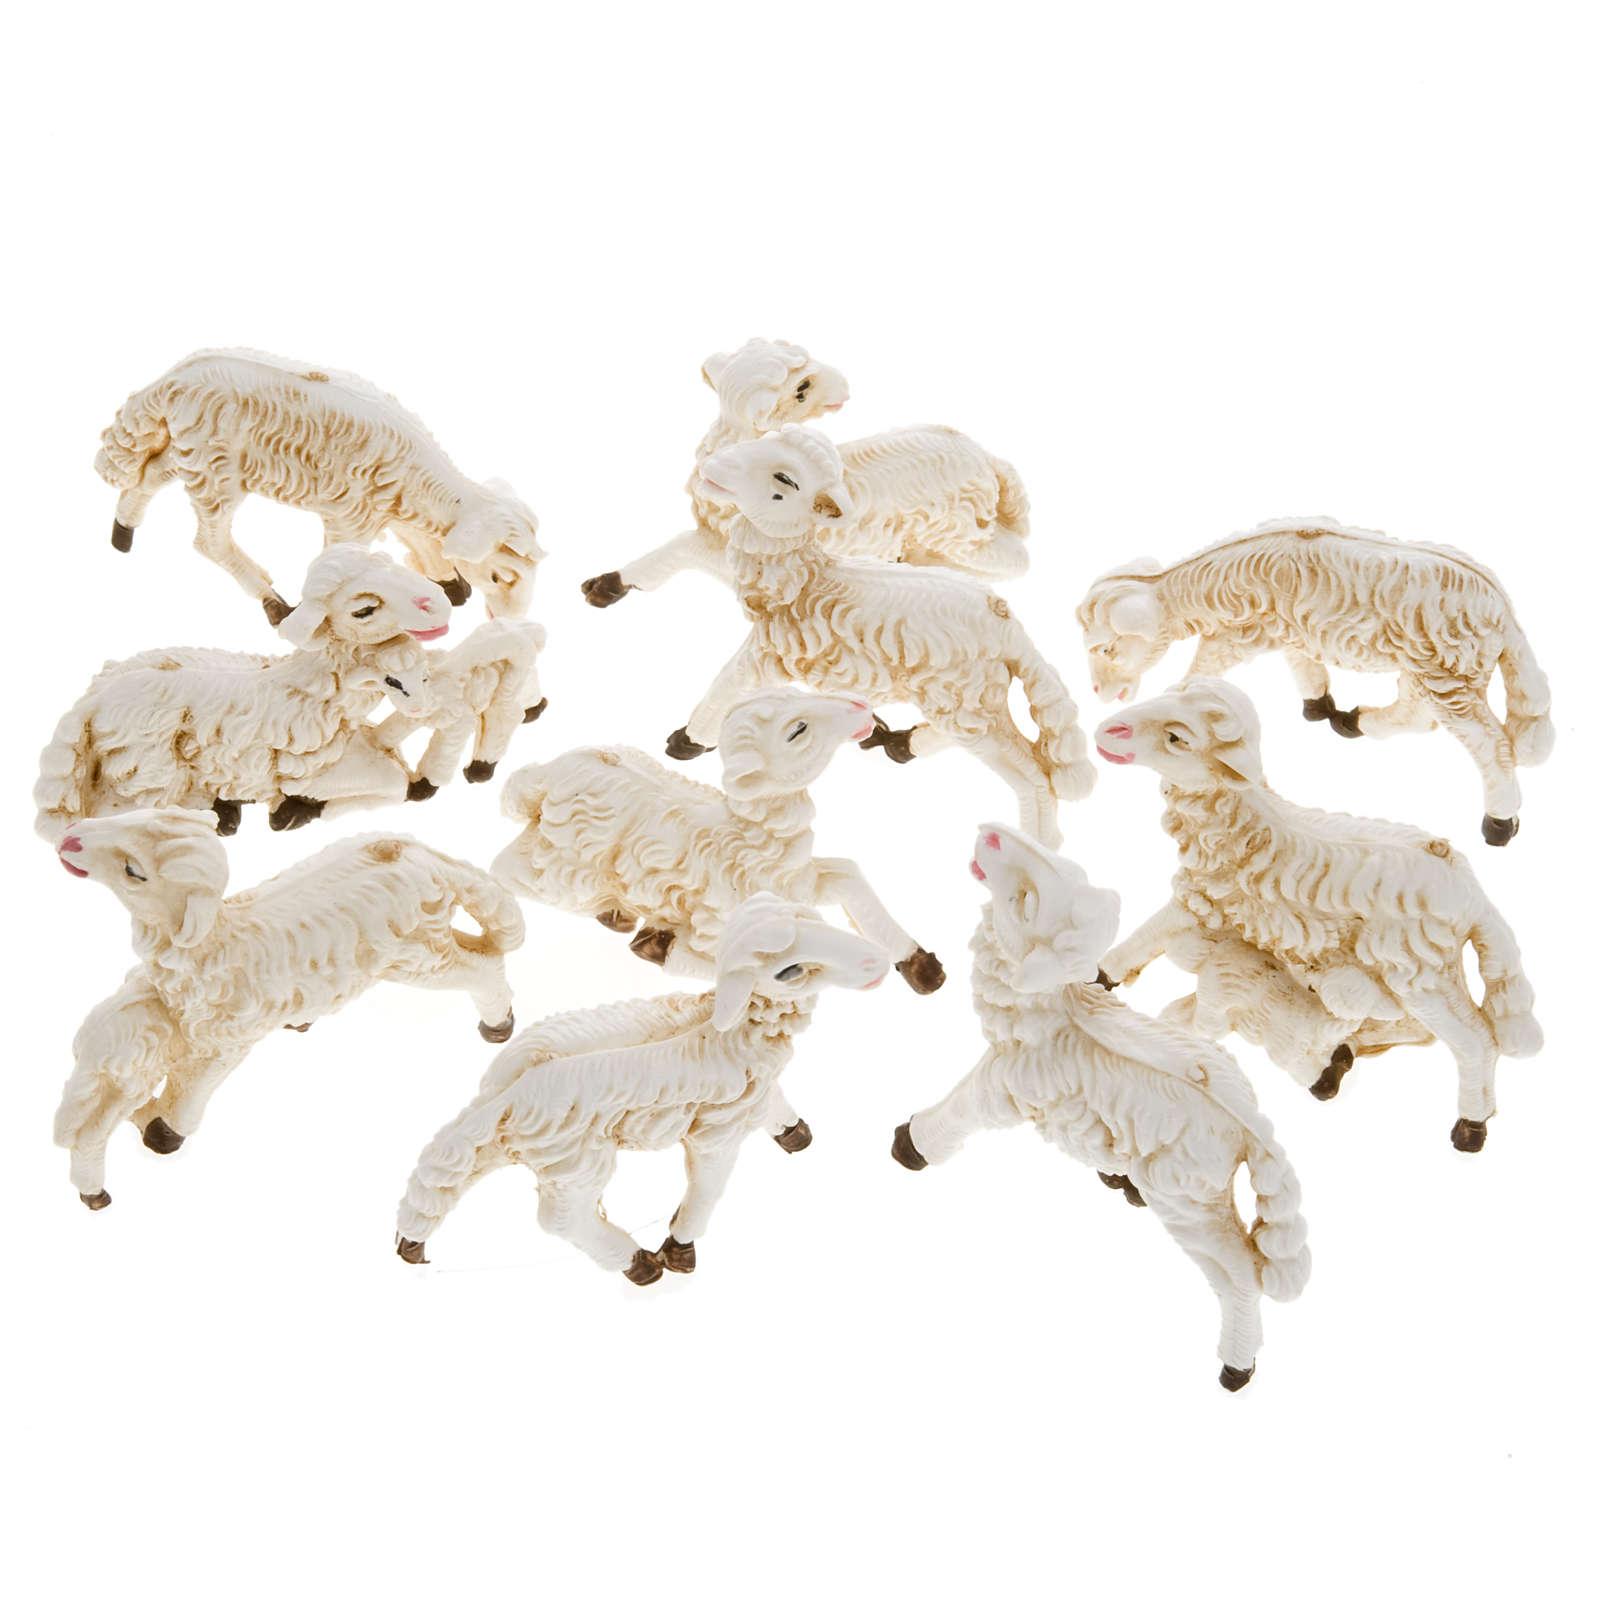 Brebis en miniature crèche 8 cm 10 pc assorties 3